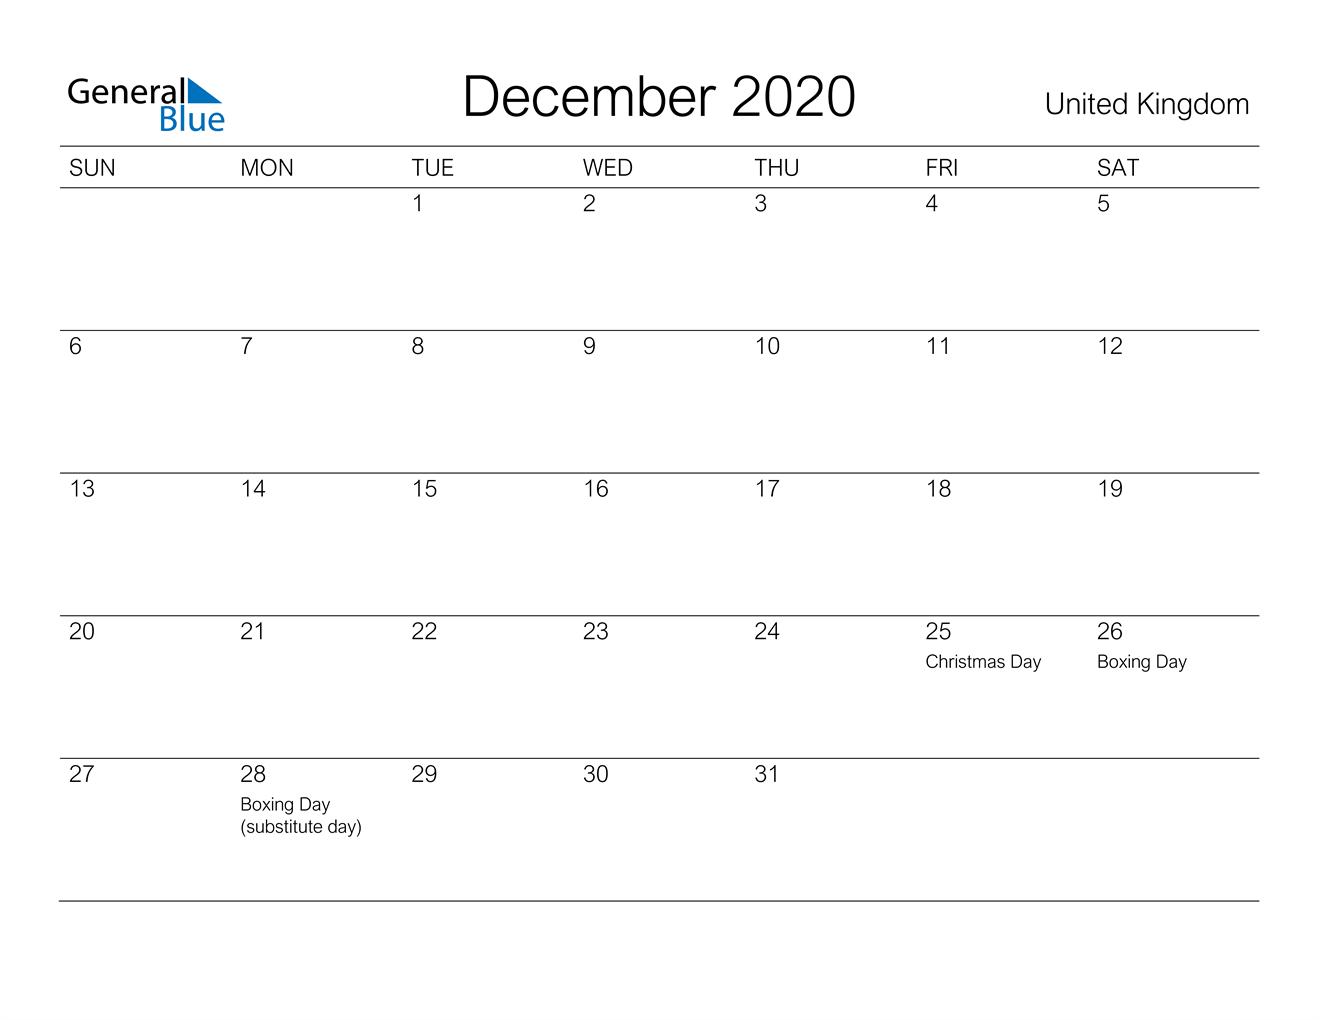 December 2020 Calendar - United Kingdom